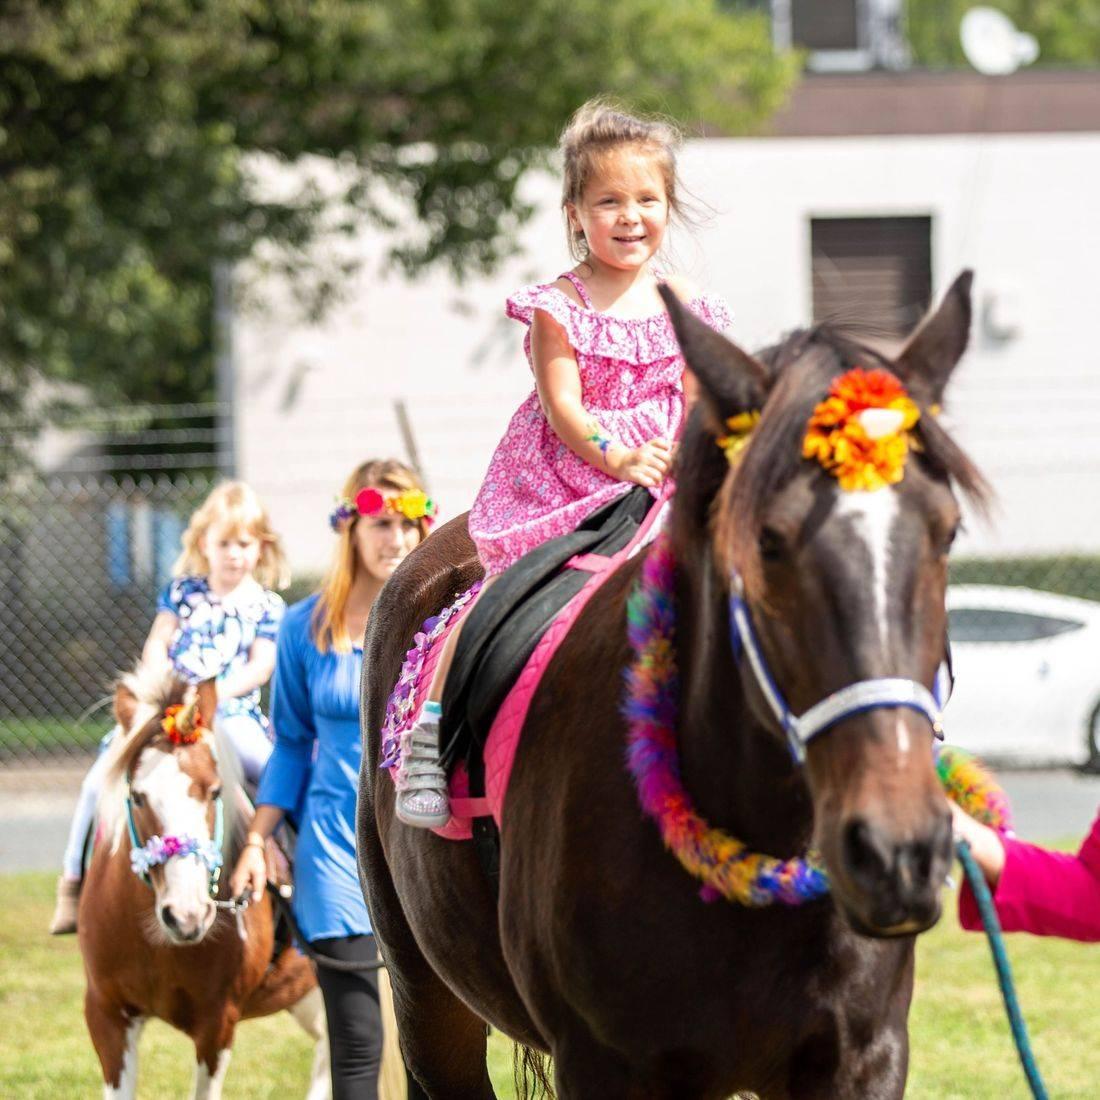 Unicorn rides, unicorn riding, horses, horse, kids, fairy festival